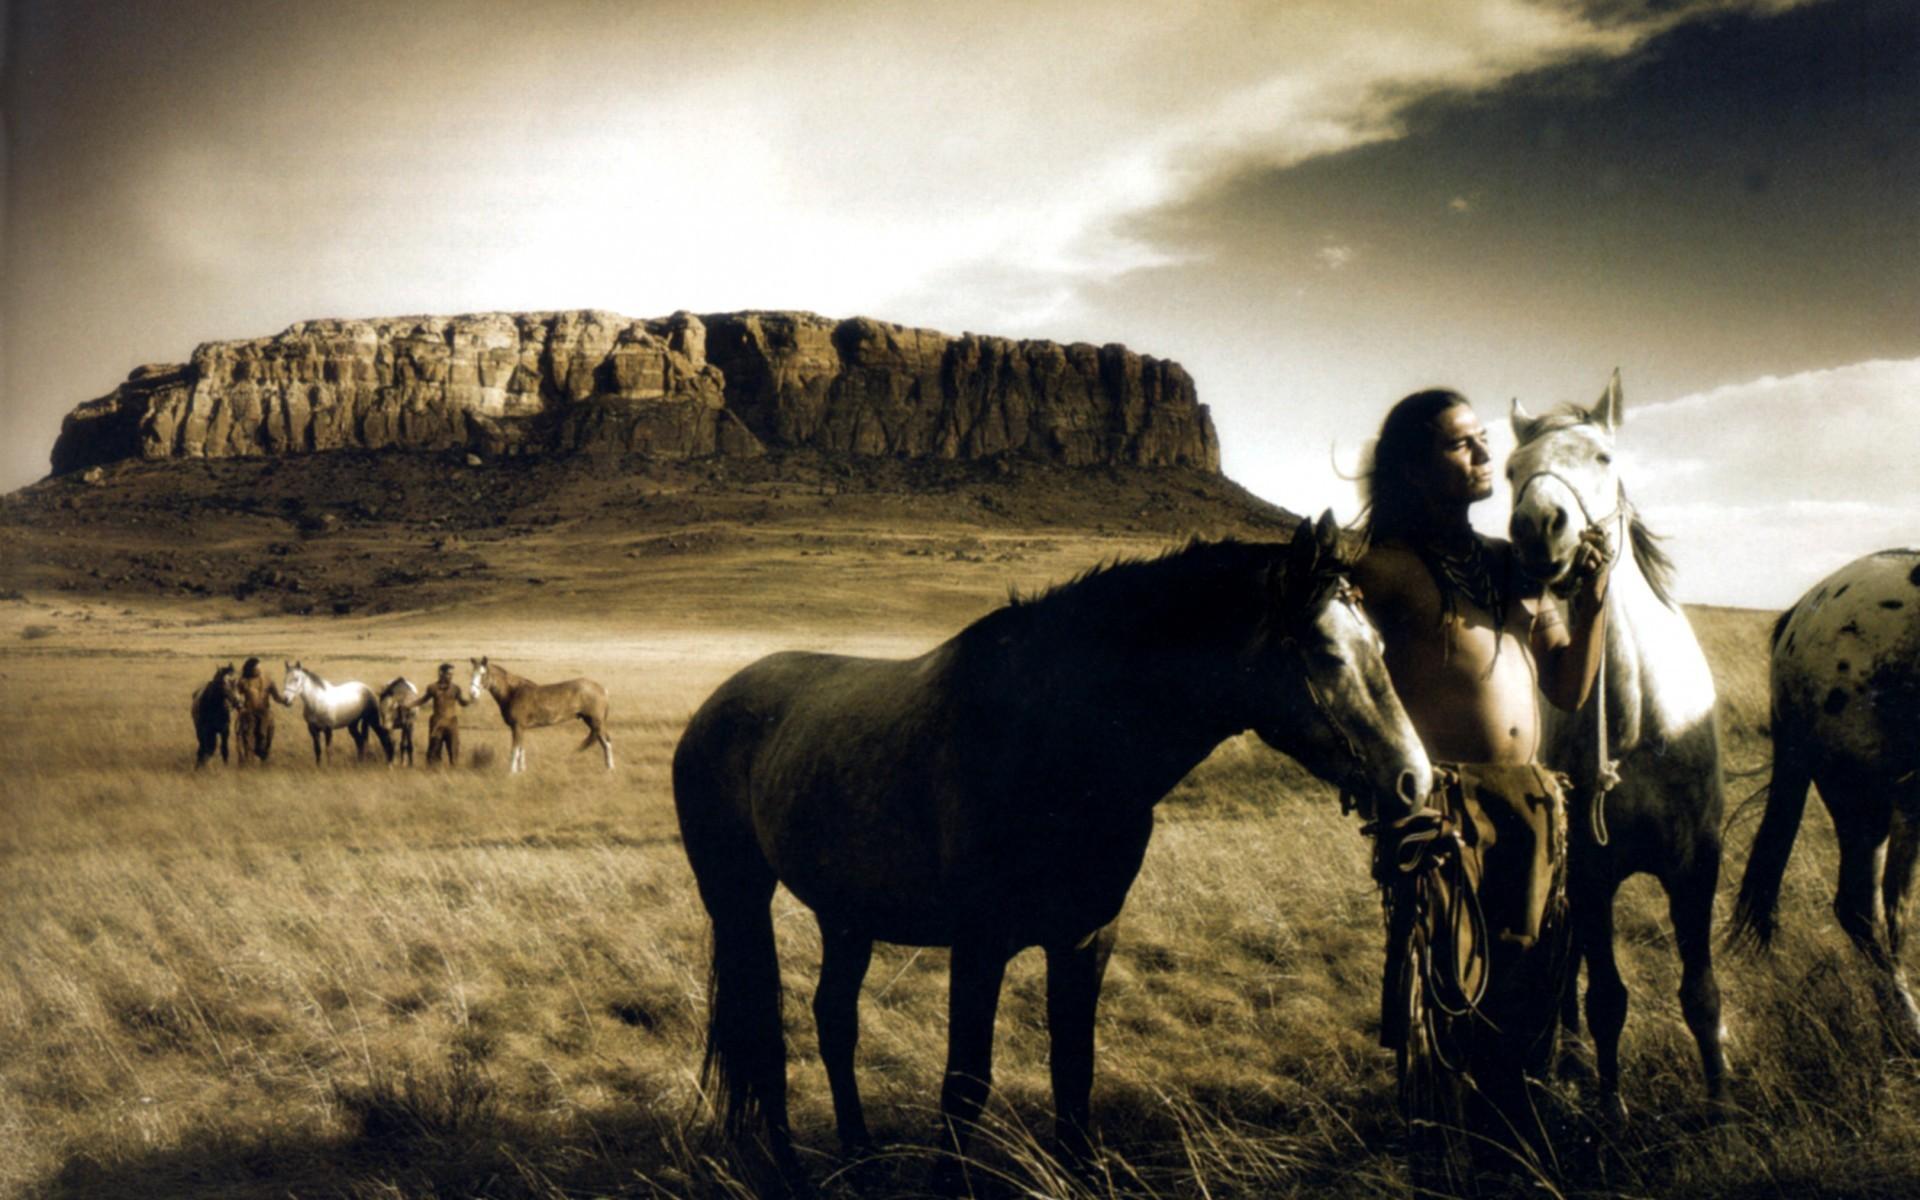 Cowboy and western desktop wallpaper 67 images - Cowboy wallpaper hd ...